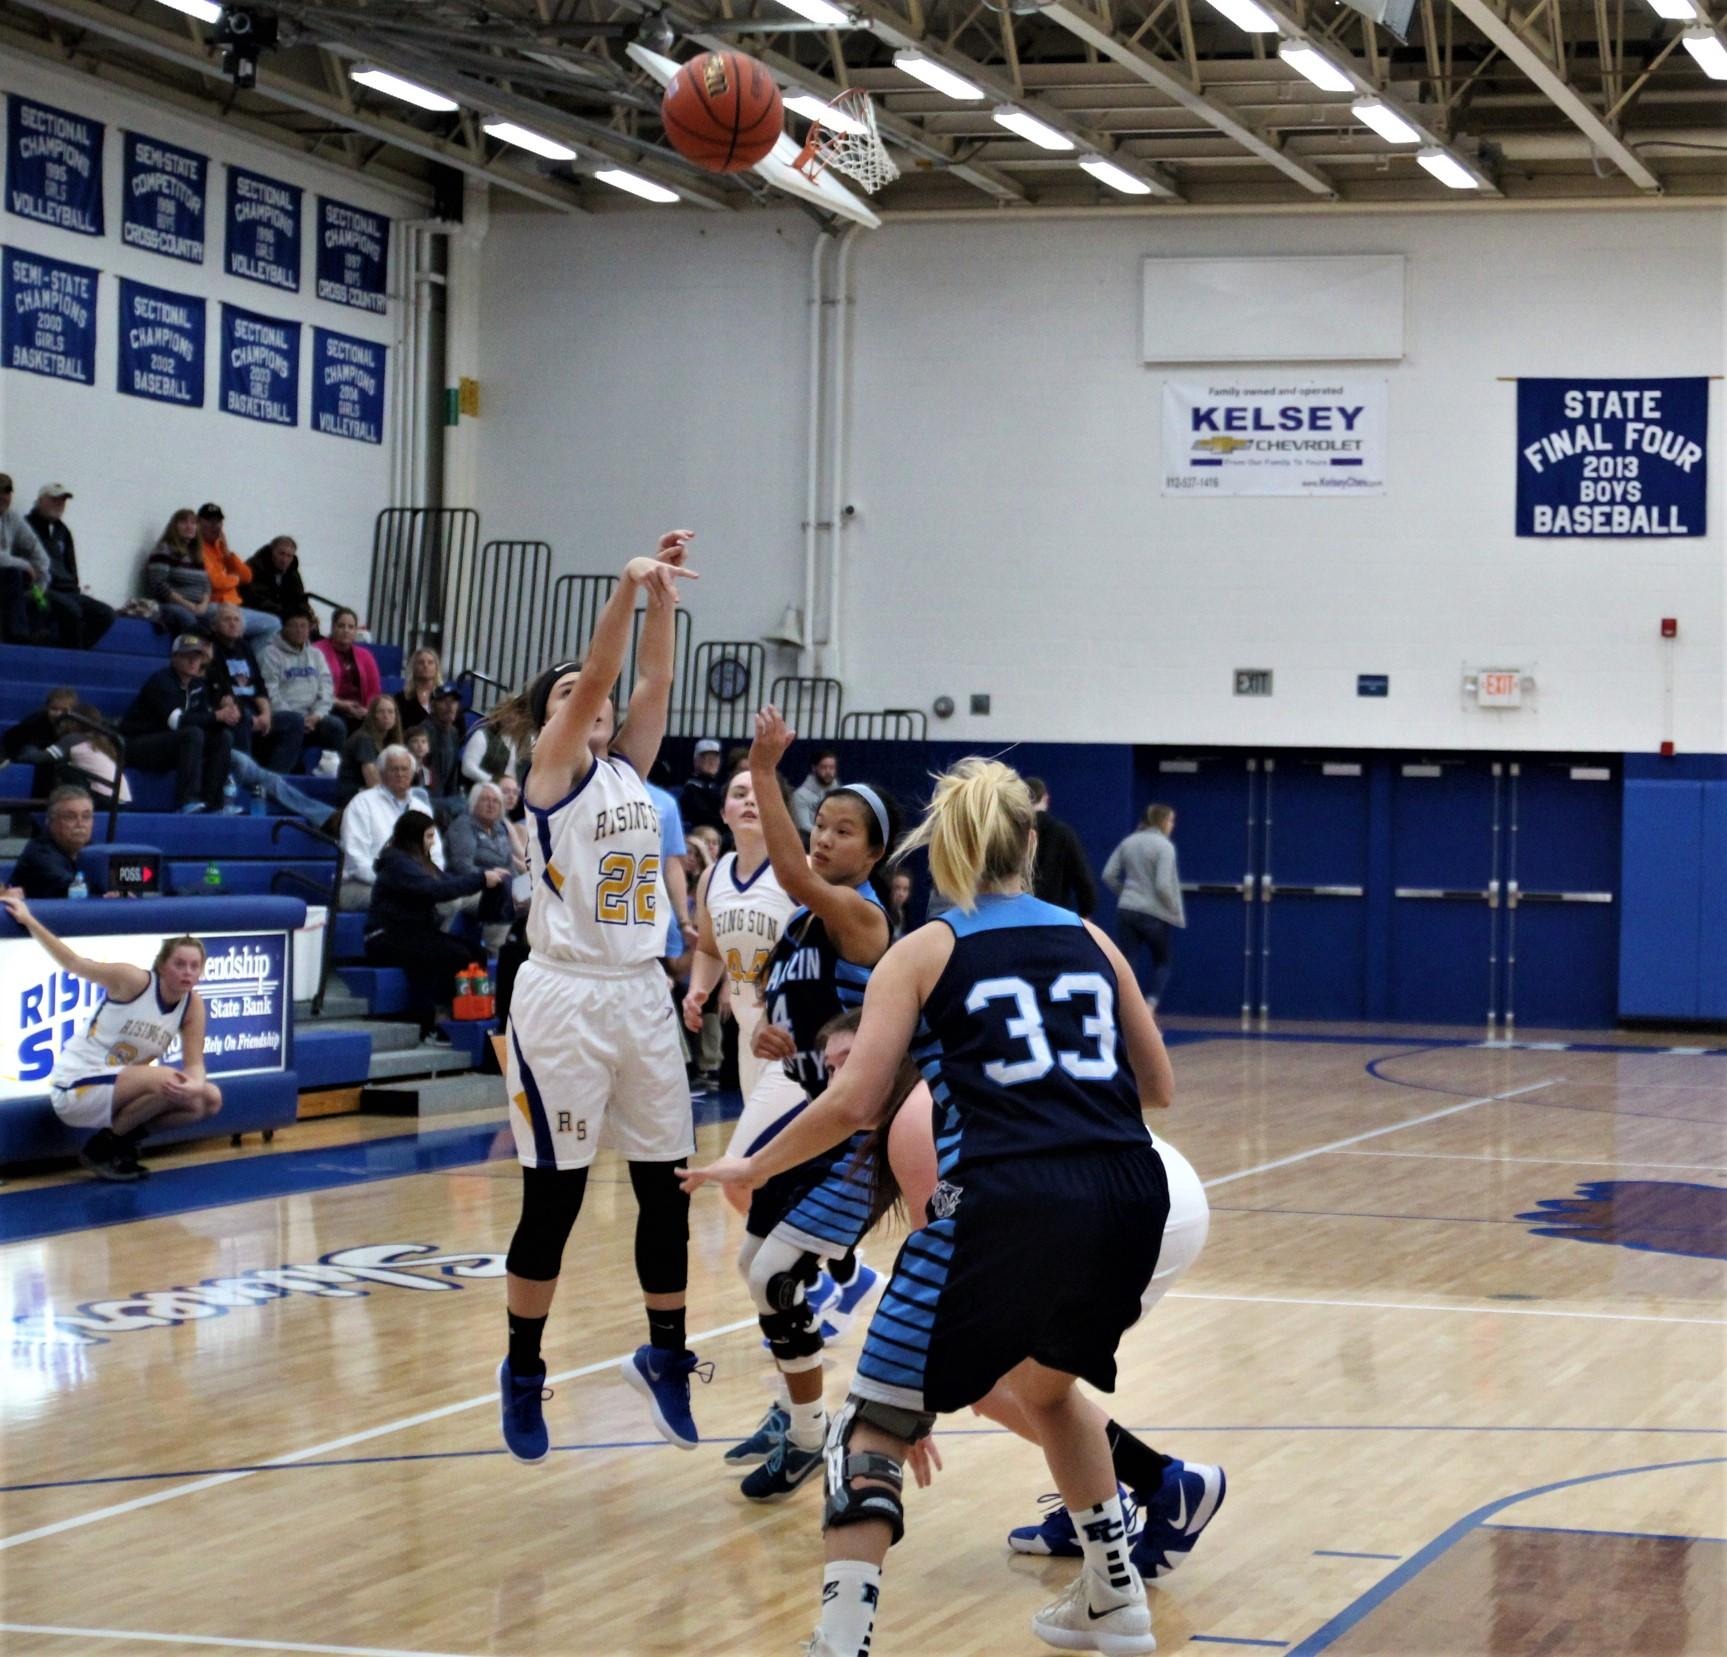 Girls Basketball vs. Lawrenceburg at Greendale Middle School